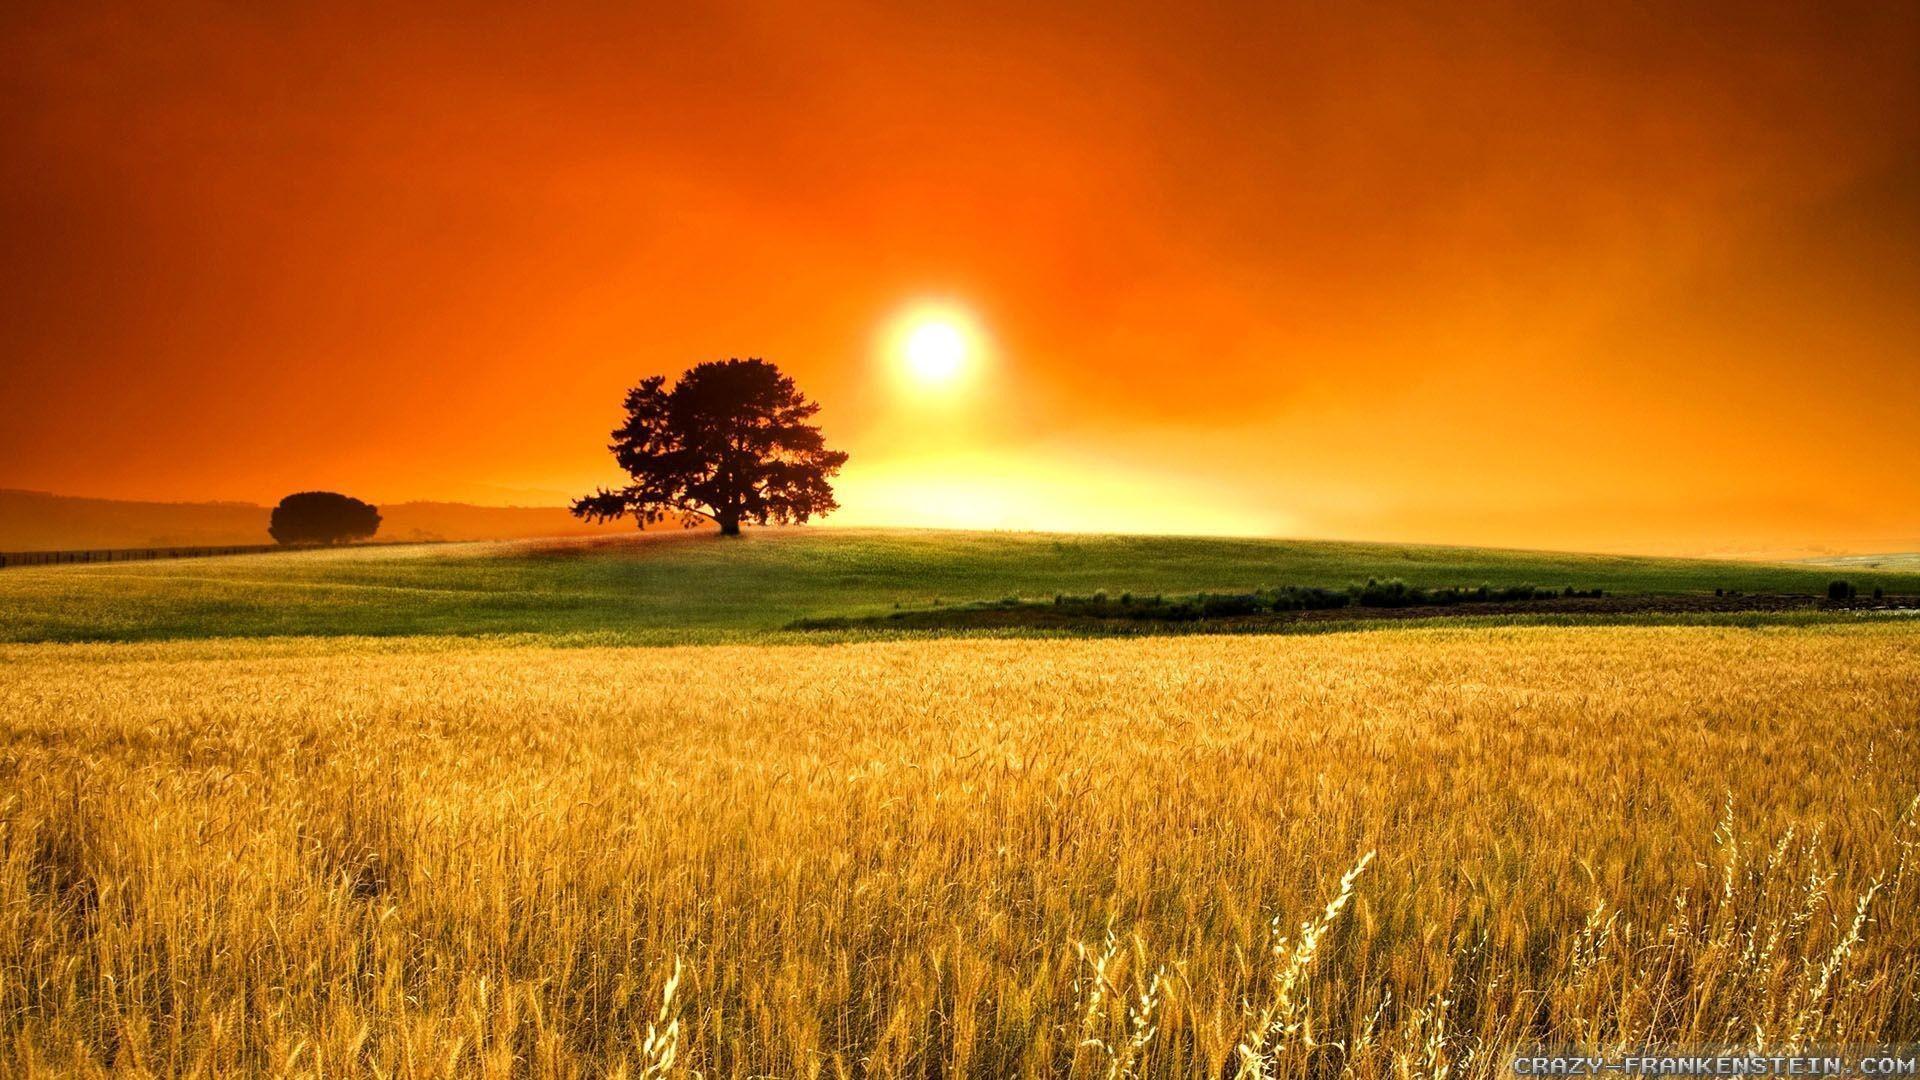 Beautiful Sunny Day wallpaper | 2560x1600 | #29420  |Sunny Beautiful Day